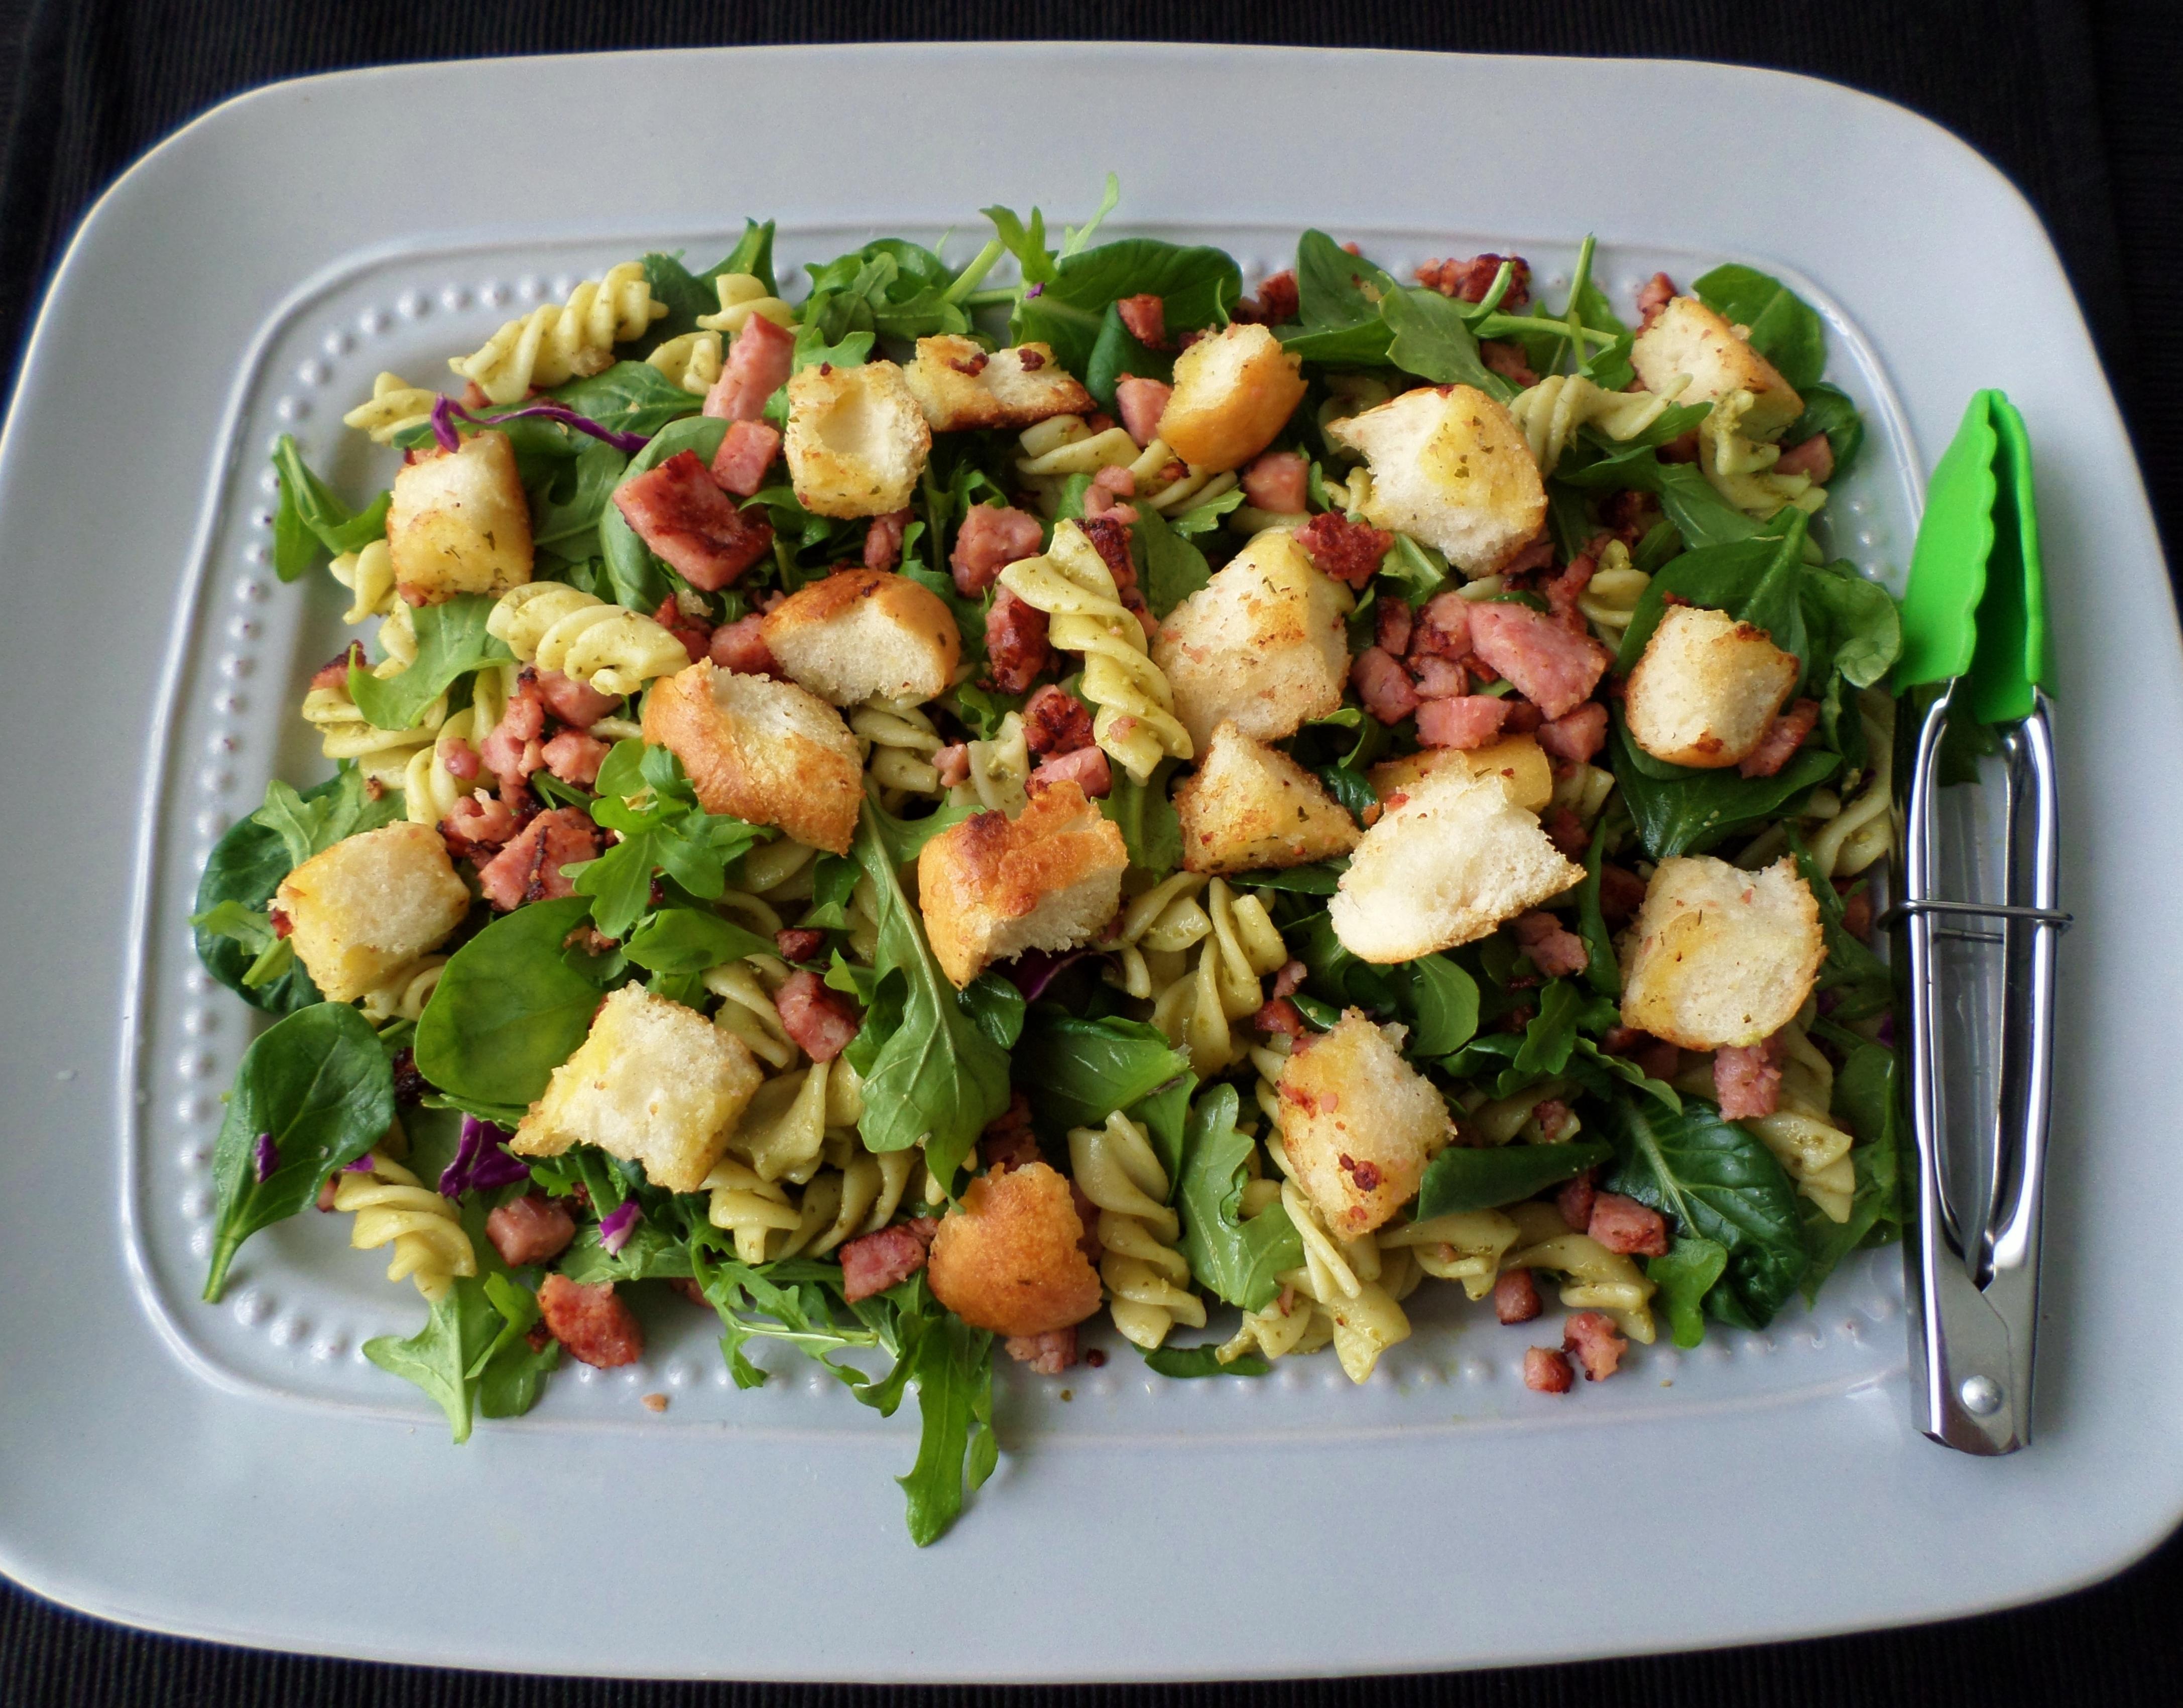 Pesto Pasta Salad with Bacon plus Garlic Croutons | Recipe Adaptors